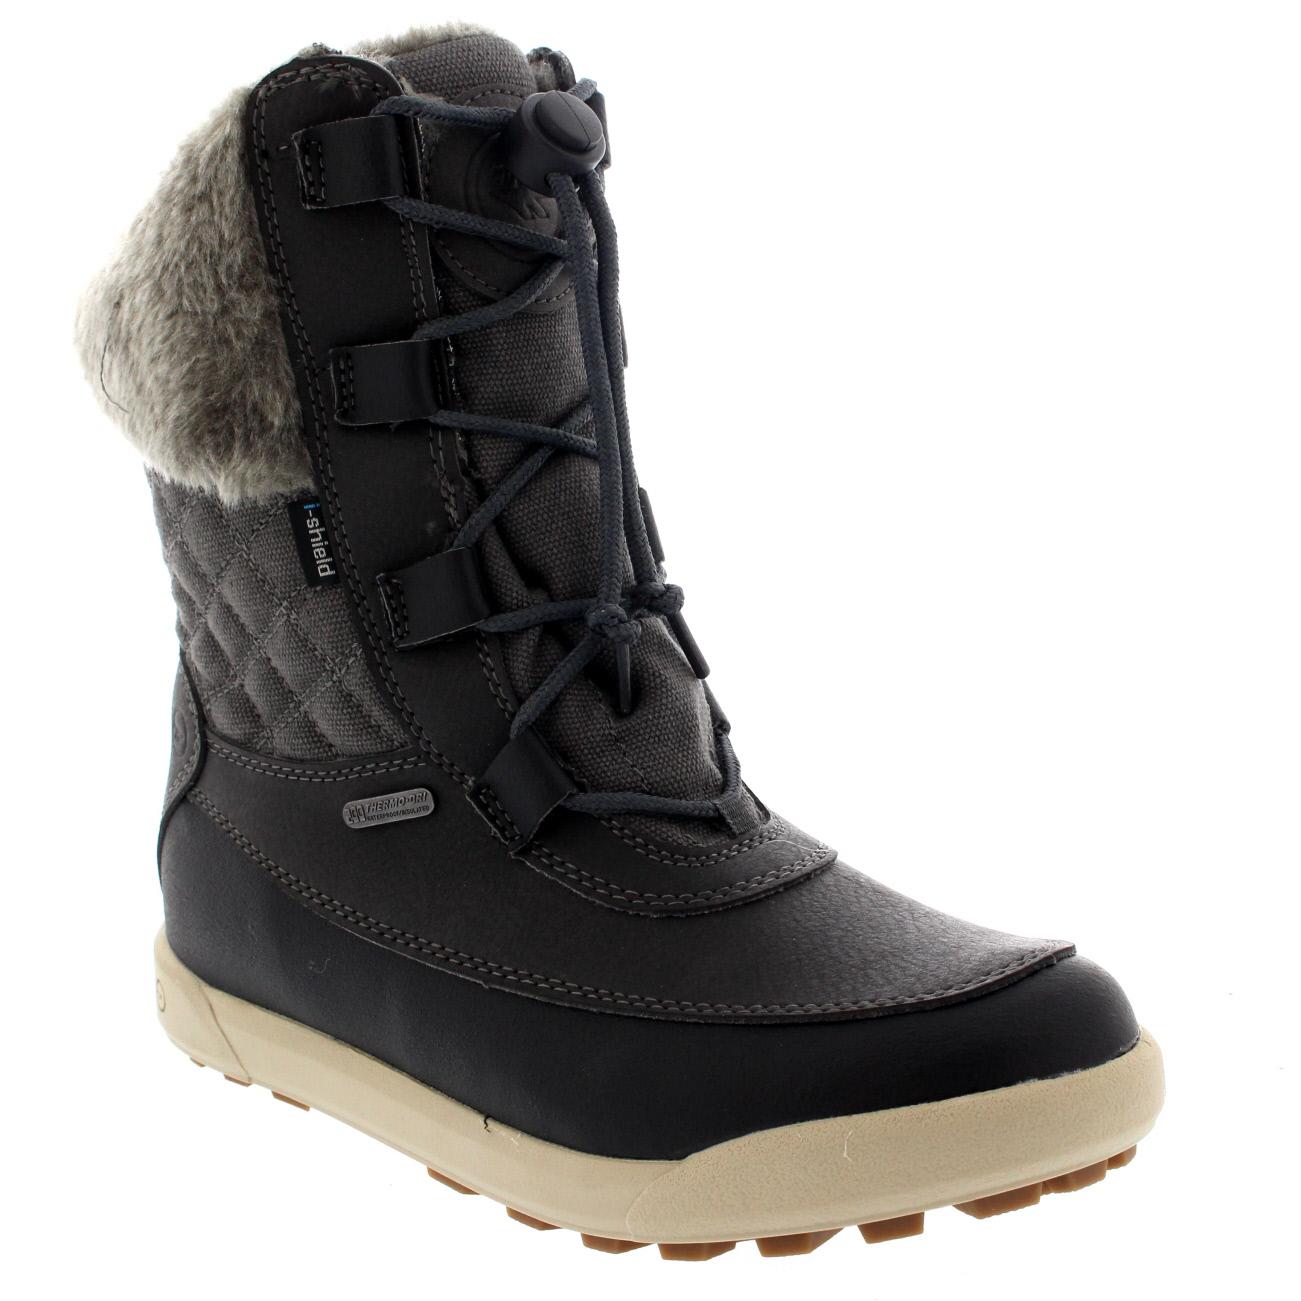 Ladies-Hi-Tec-Dubois-200-Leather-Laced-Rain-Mid-Calf-Winter-Snow-Boots-All-Sizes